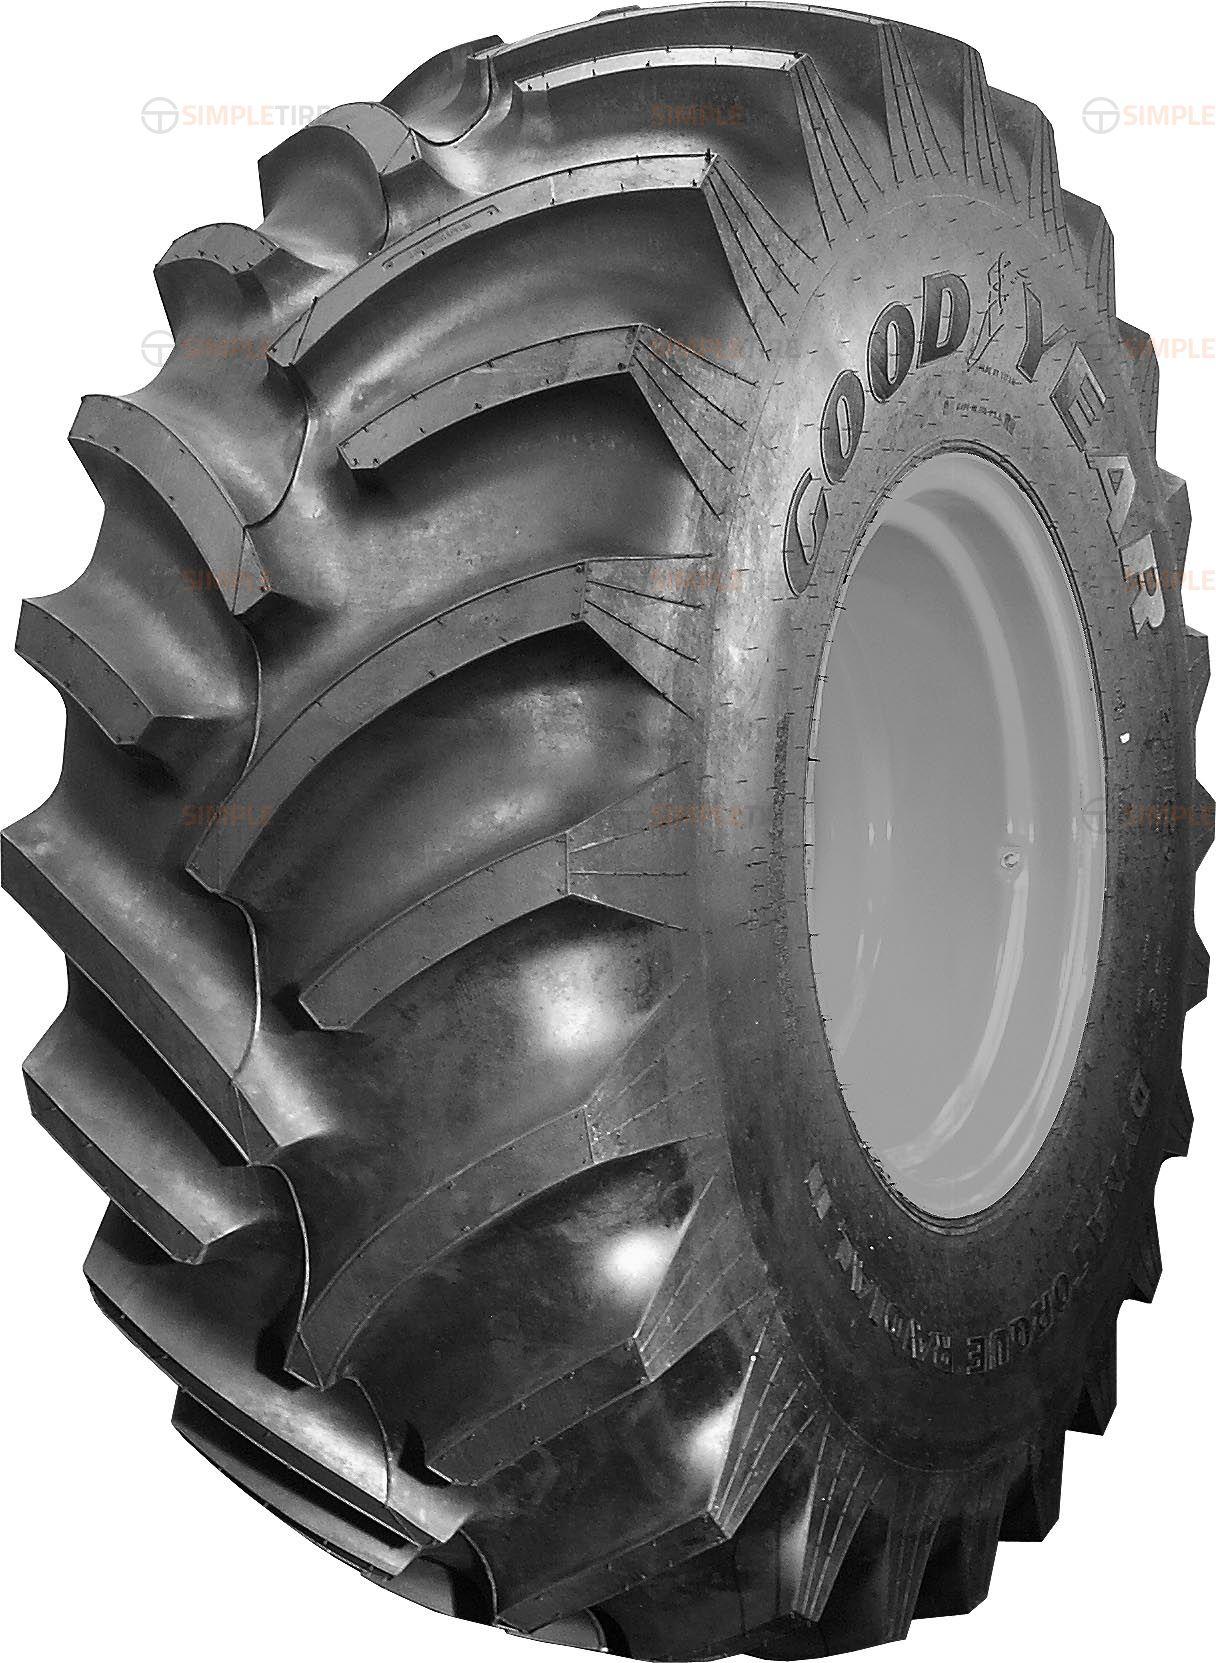 Titan tires buy titan tires online simpletire tire size 124r 24 buycottarizona